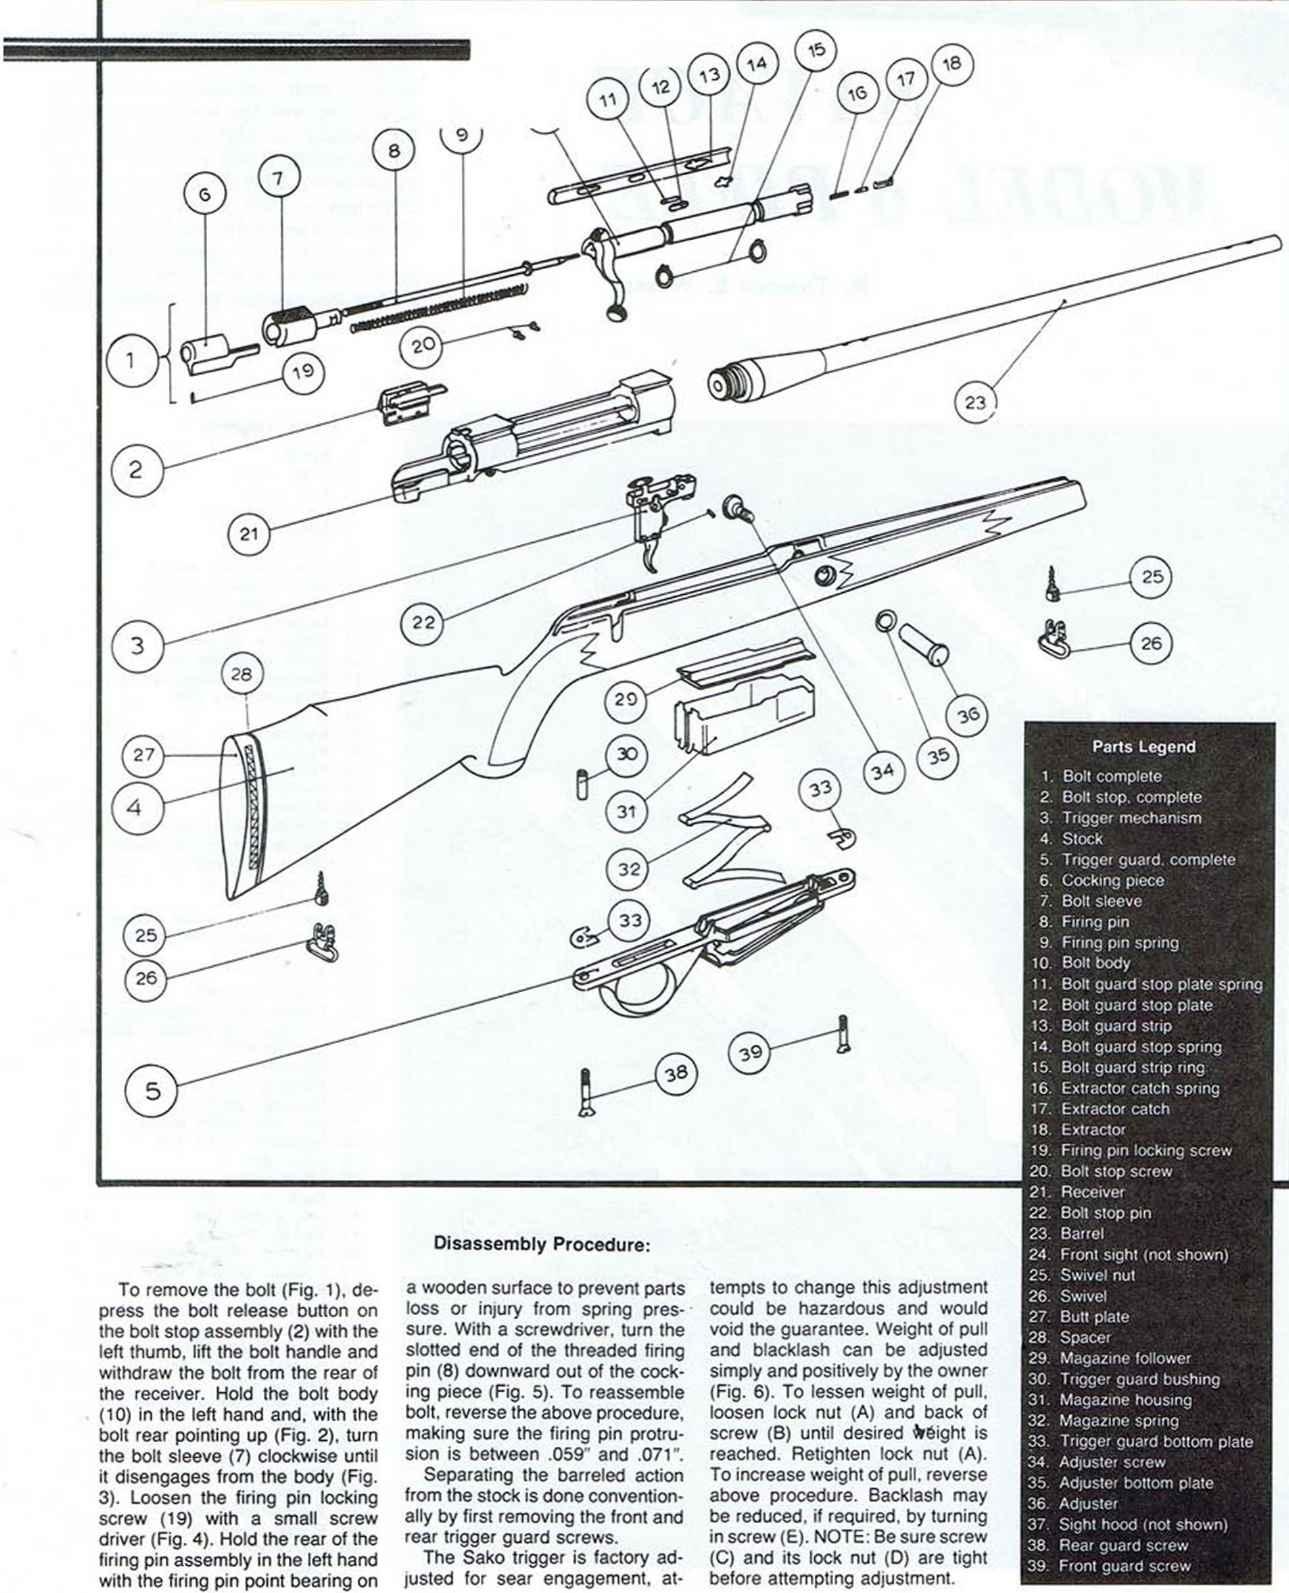 Exploded Views Firearms Assembly Bev Fitchetts Guns Magazine 1911 Diagram Colt Trigger Mechanism Parts Legend